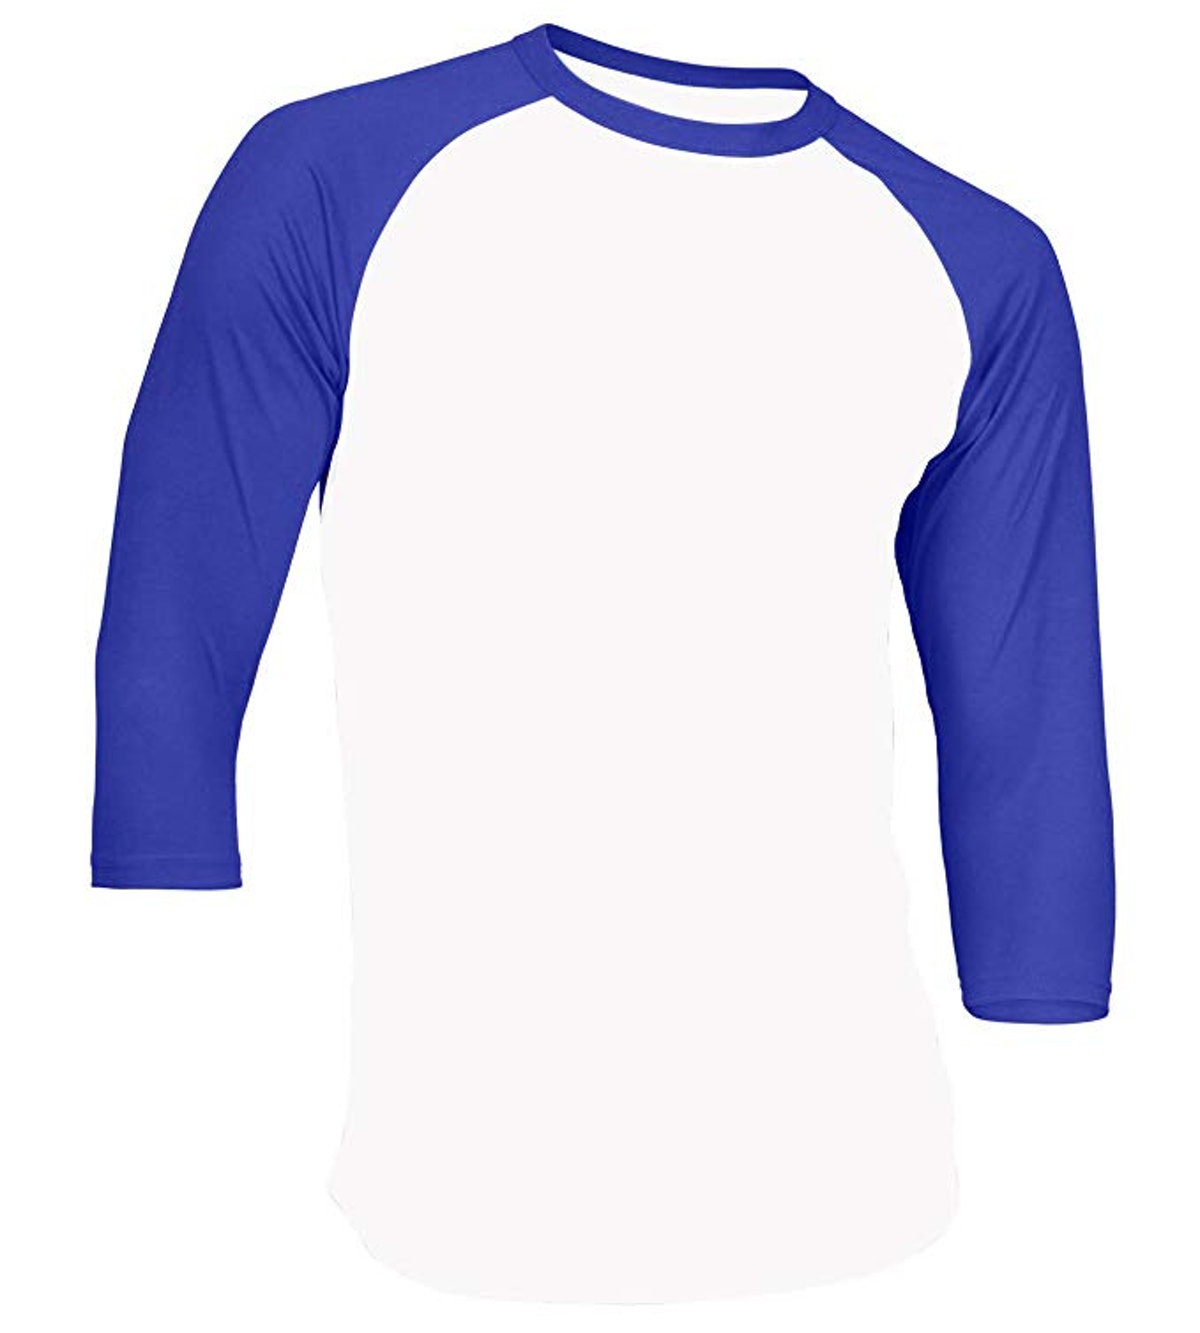 Raglan Shirt 3/4 Sleeve Athletic Baseball Jersey